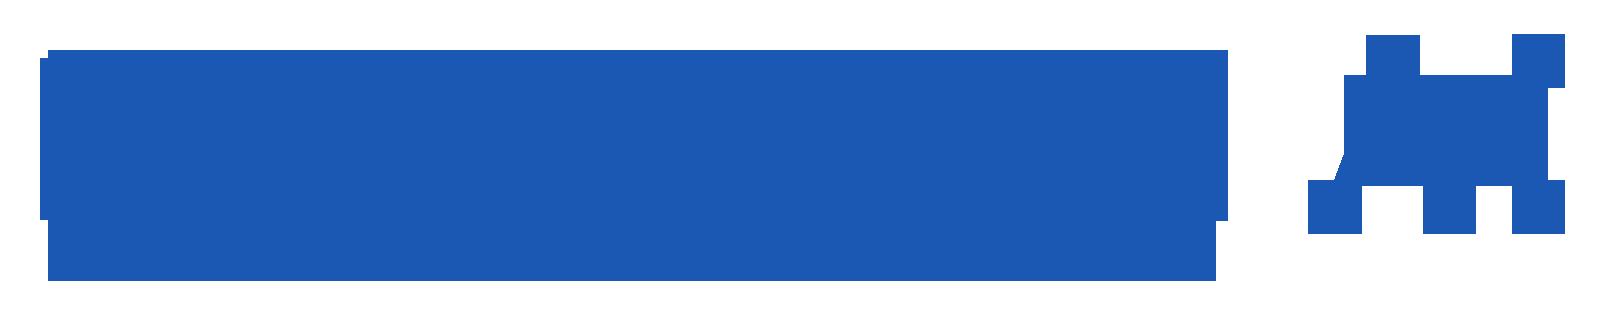 DeepFraud AI logo